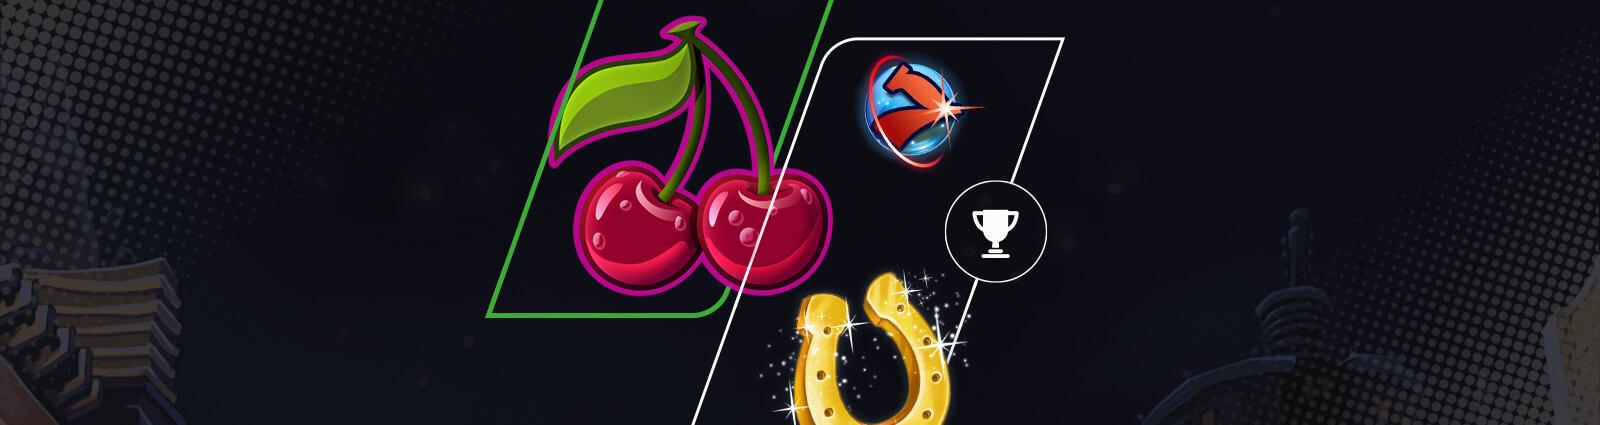 unibet_casino_challenge_2